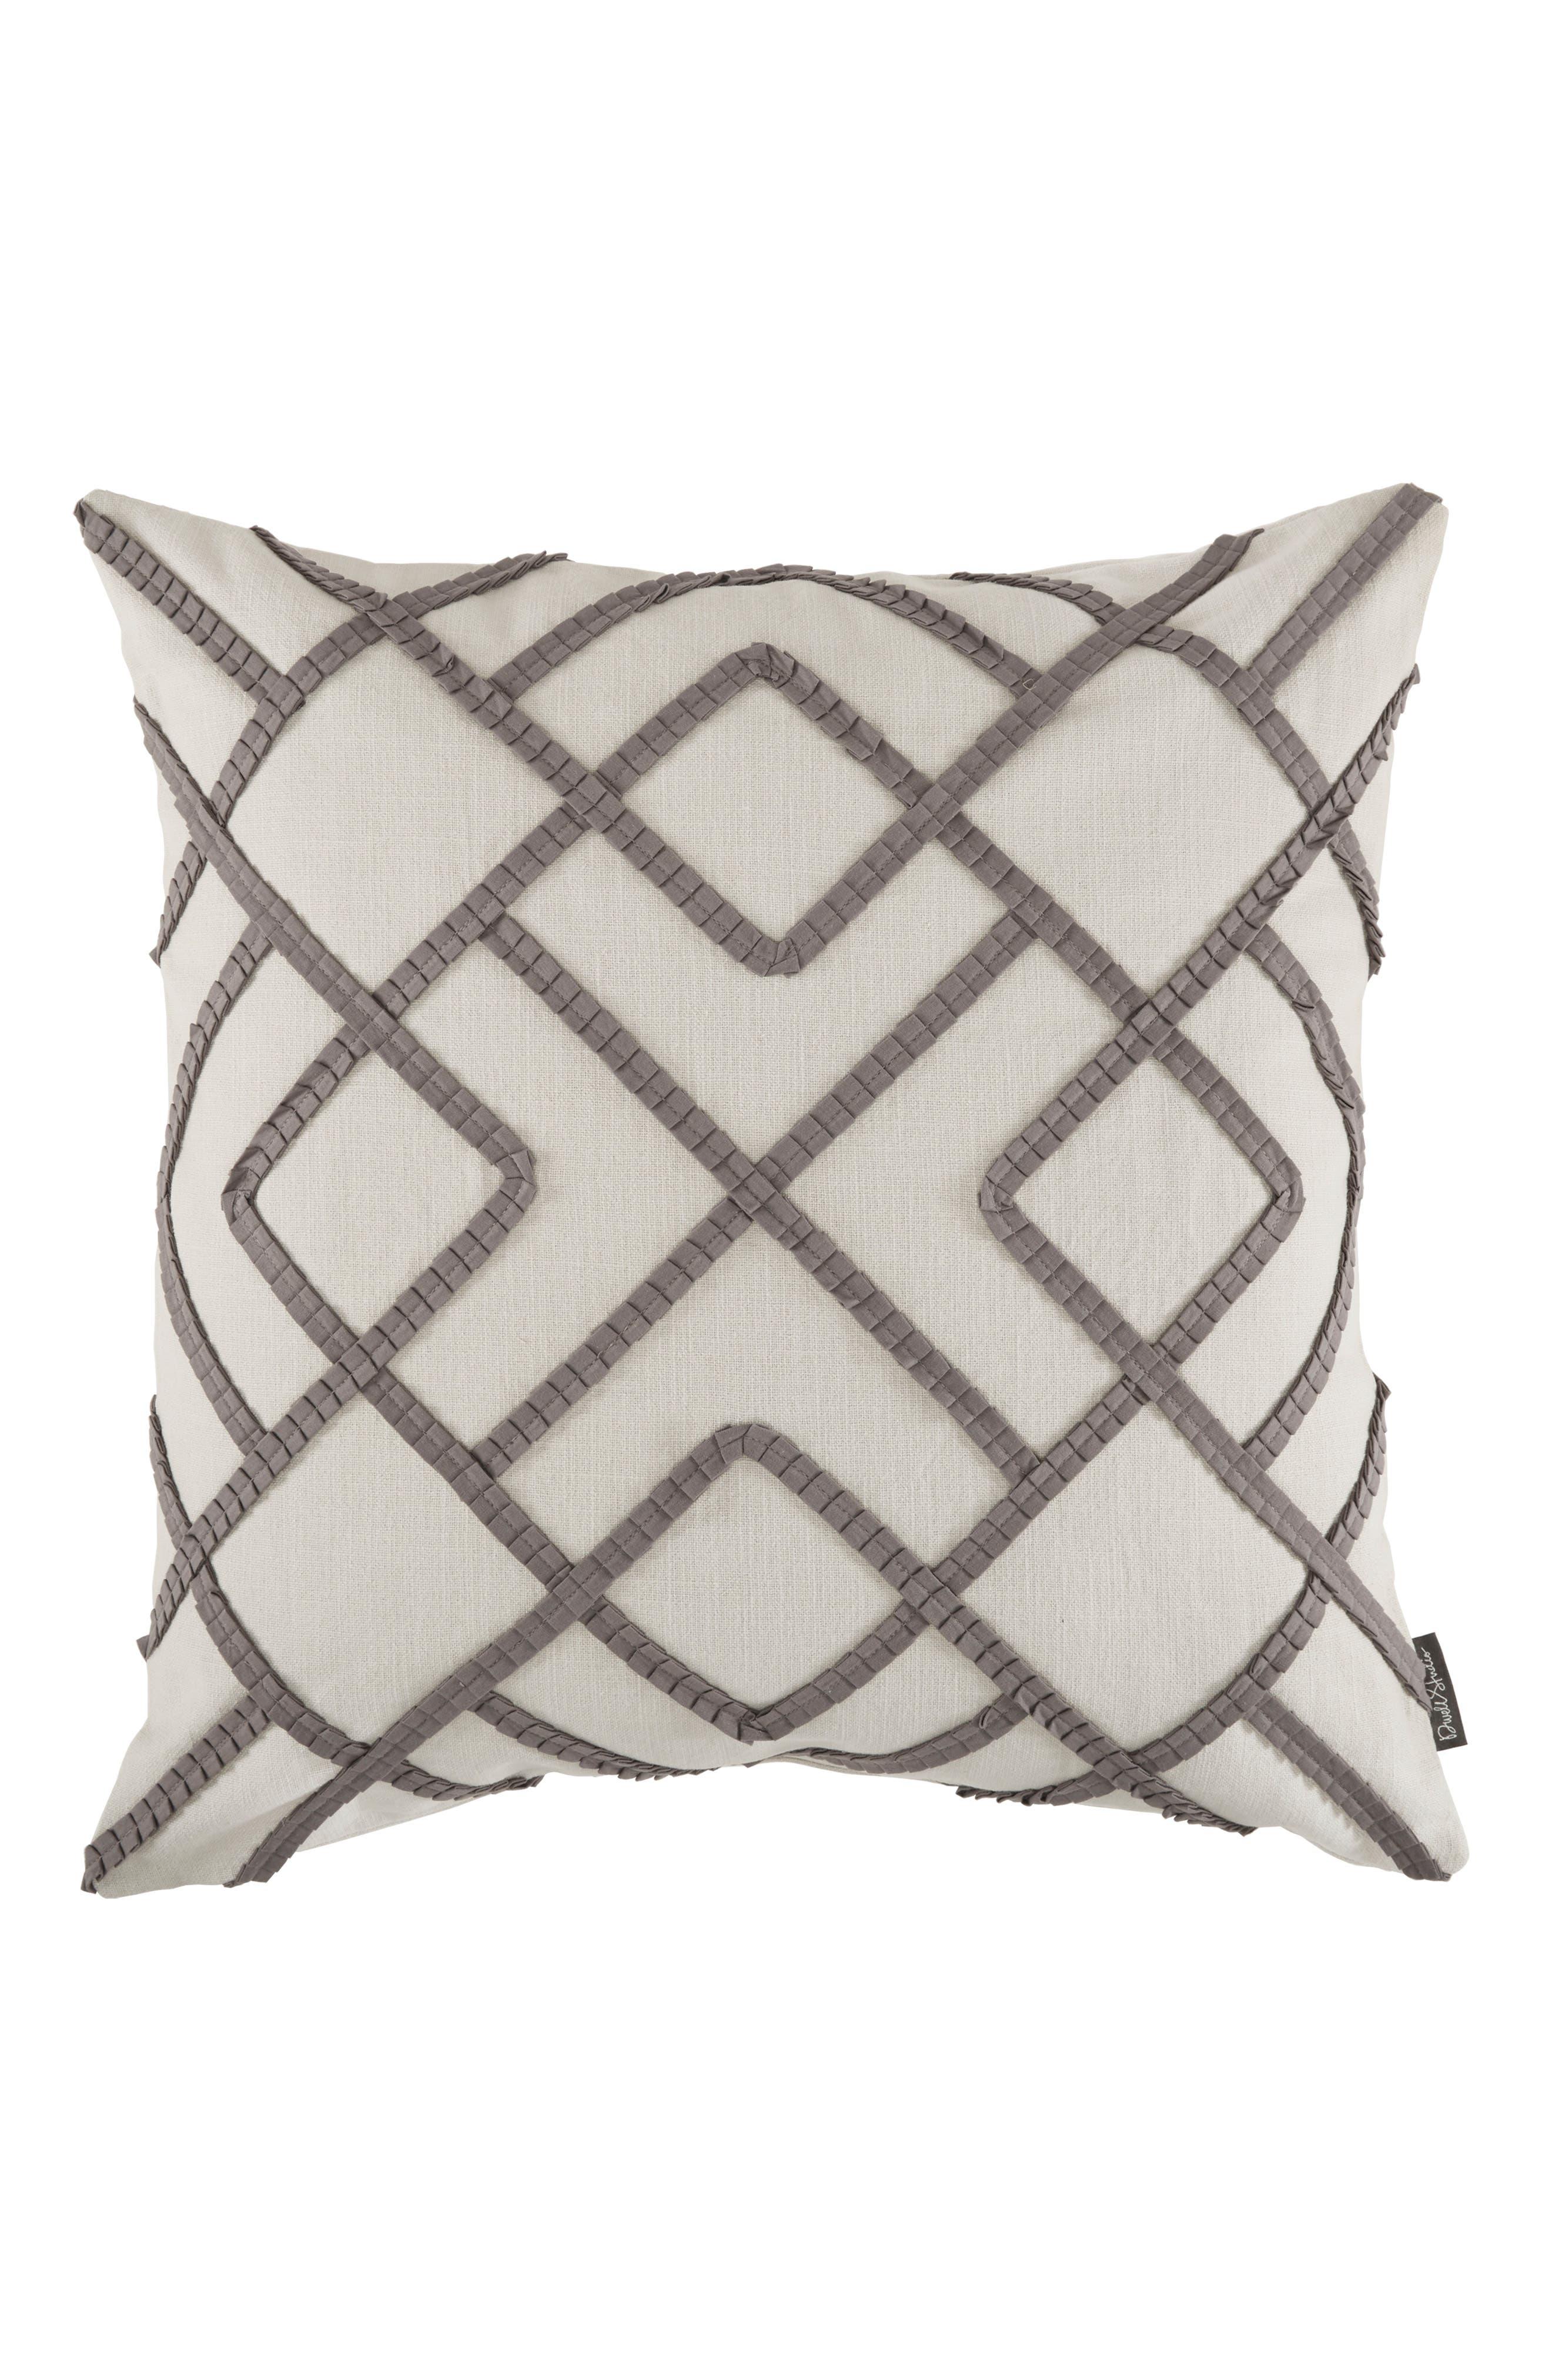 Windsor Accent Pillow,                             Main thumbnail 1, color,                             020